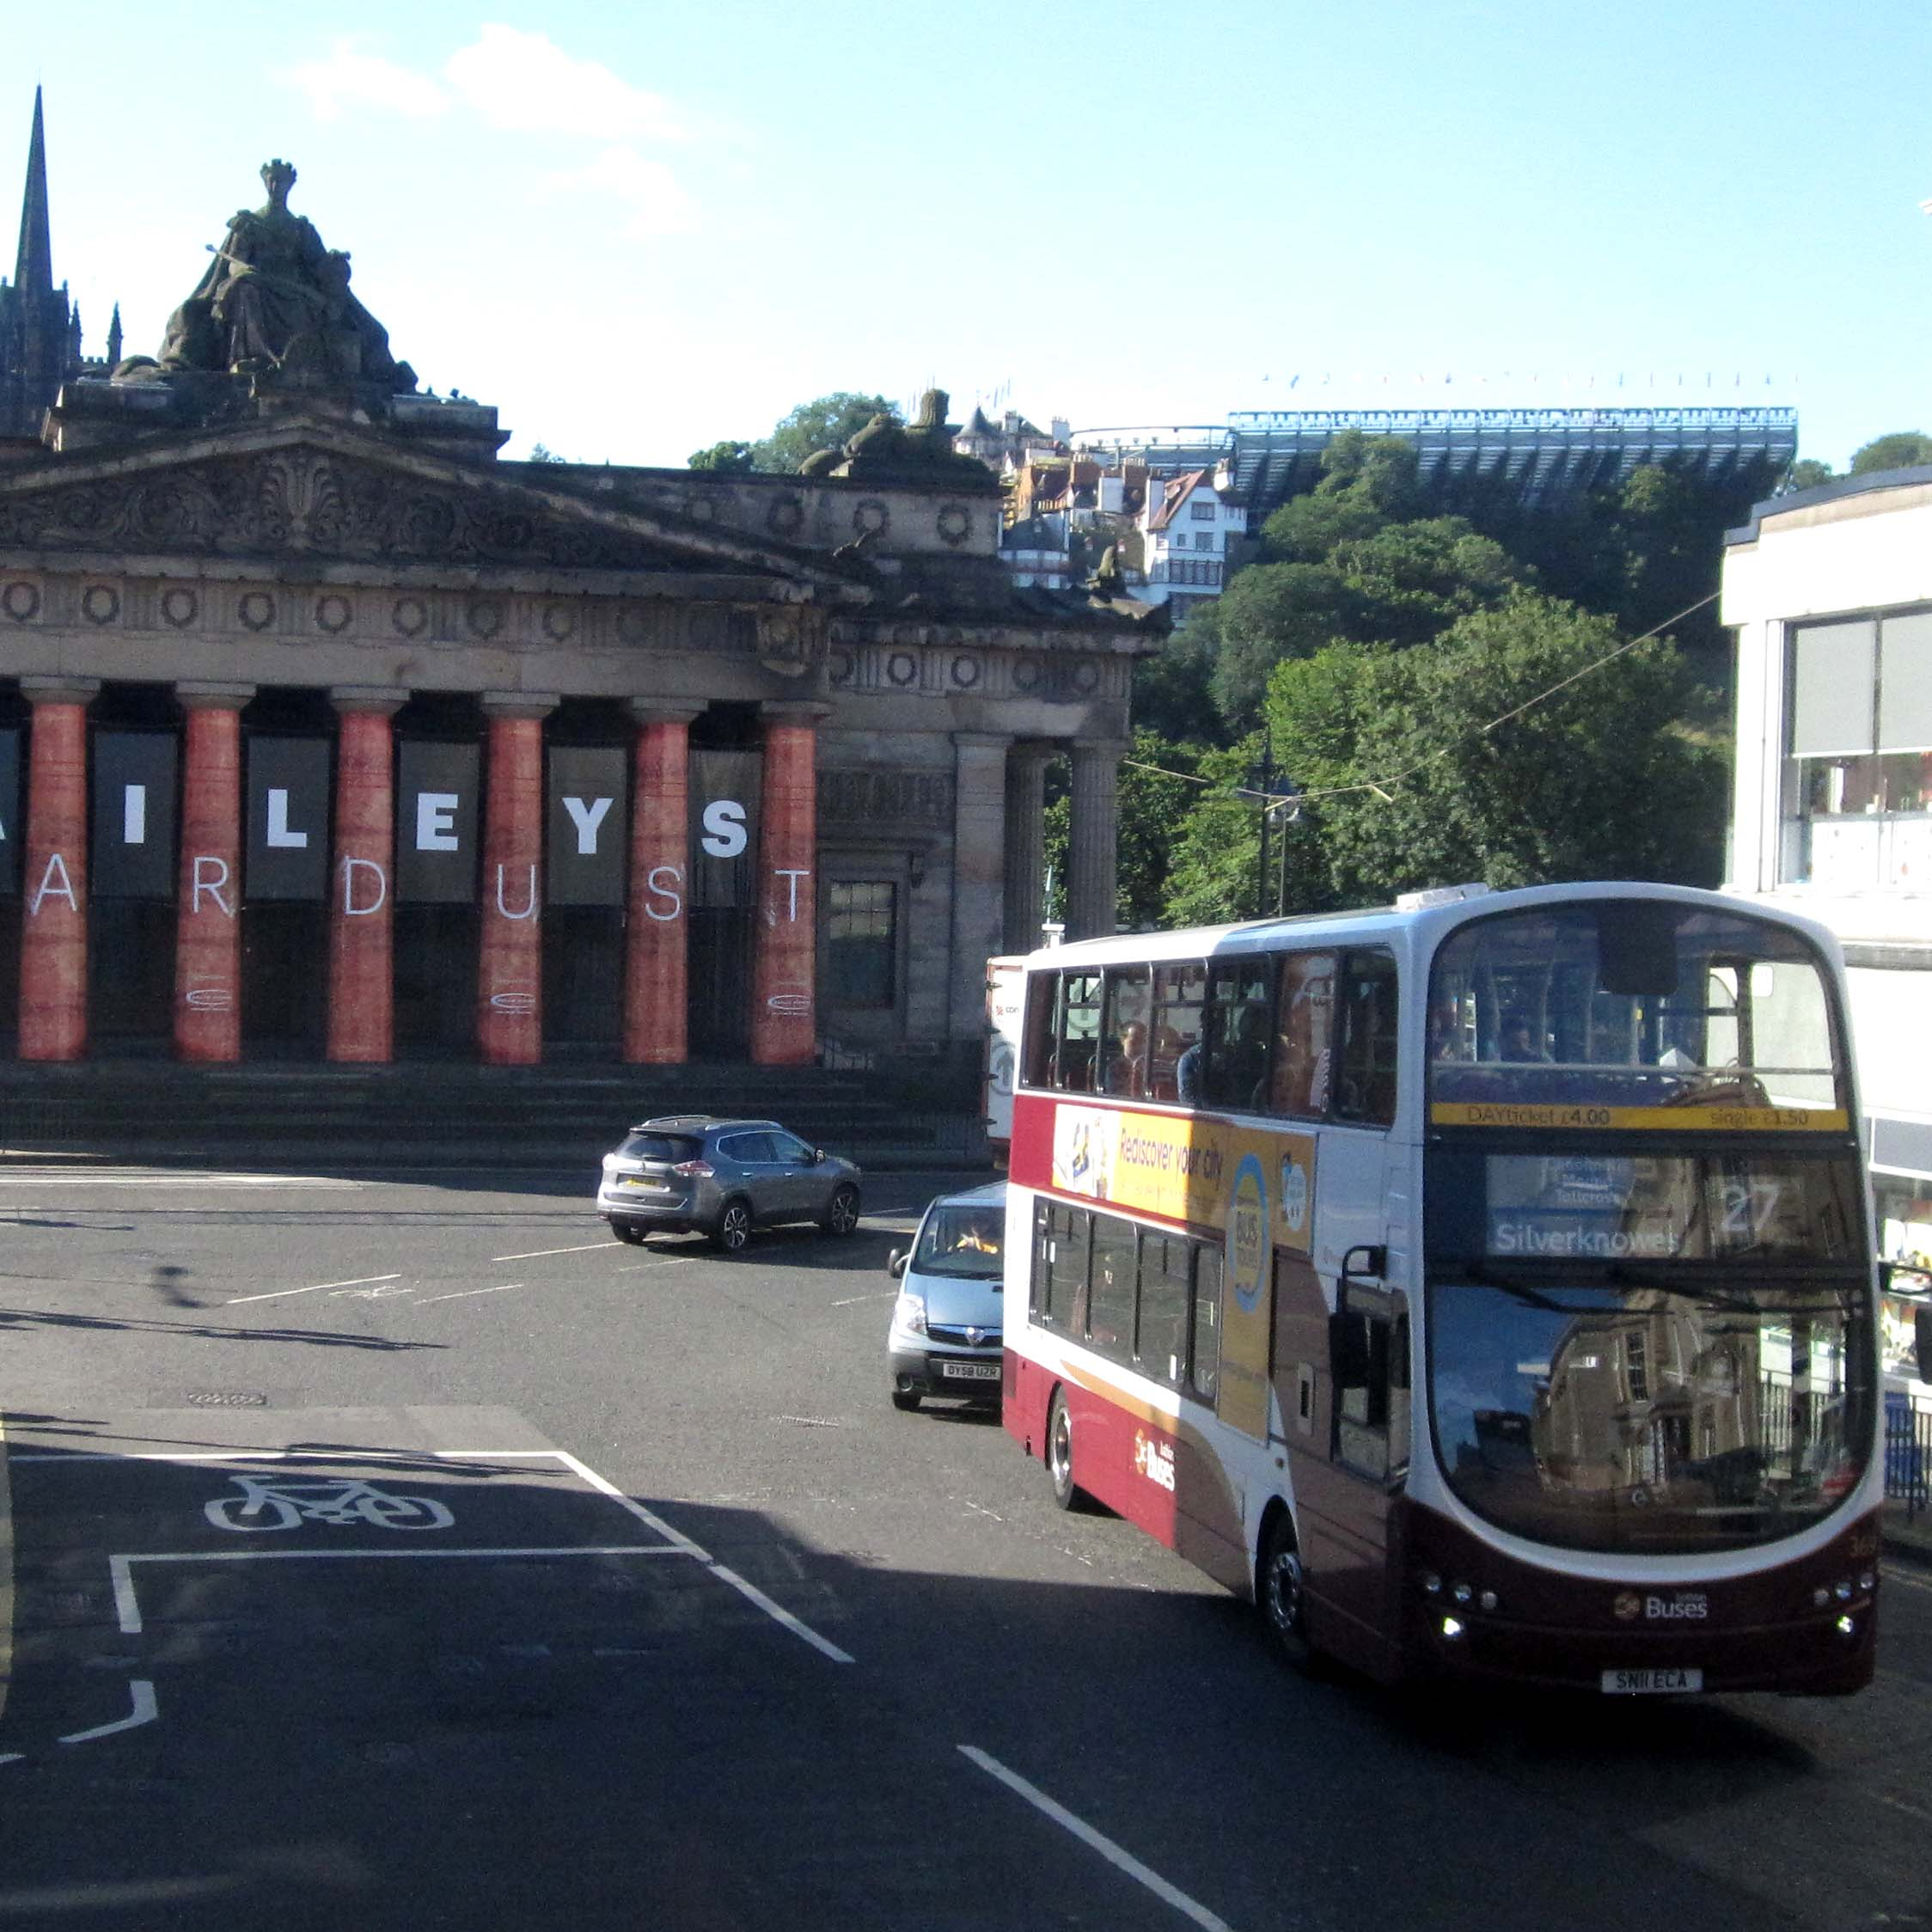 Light Shop In Edinburgh: Get Around Edinburgh On Public Transportation